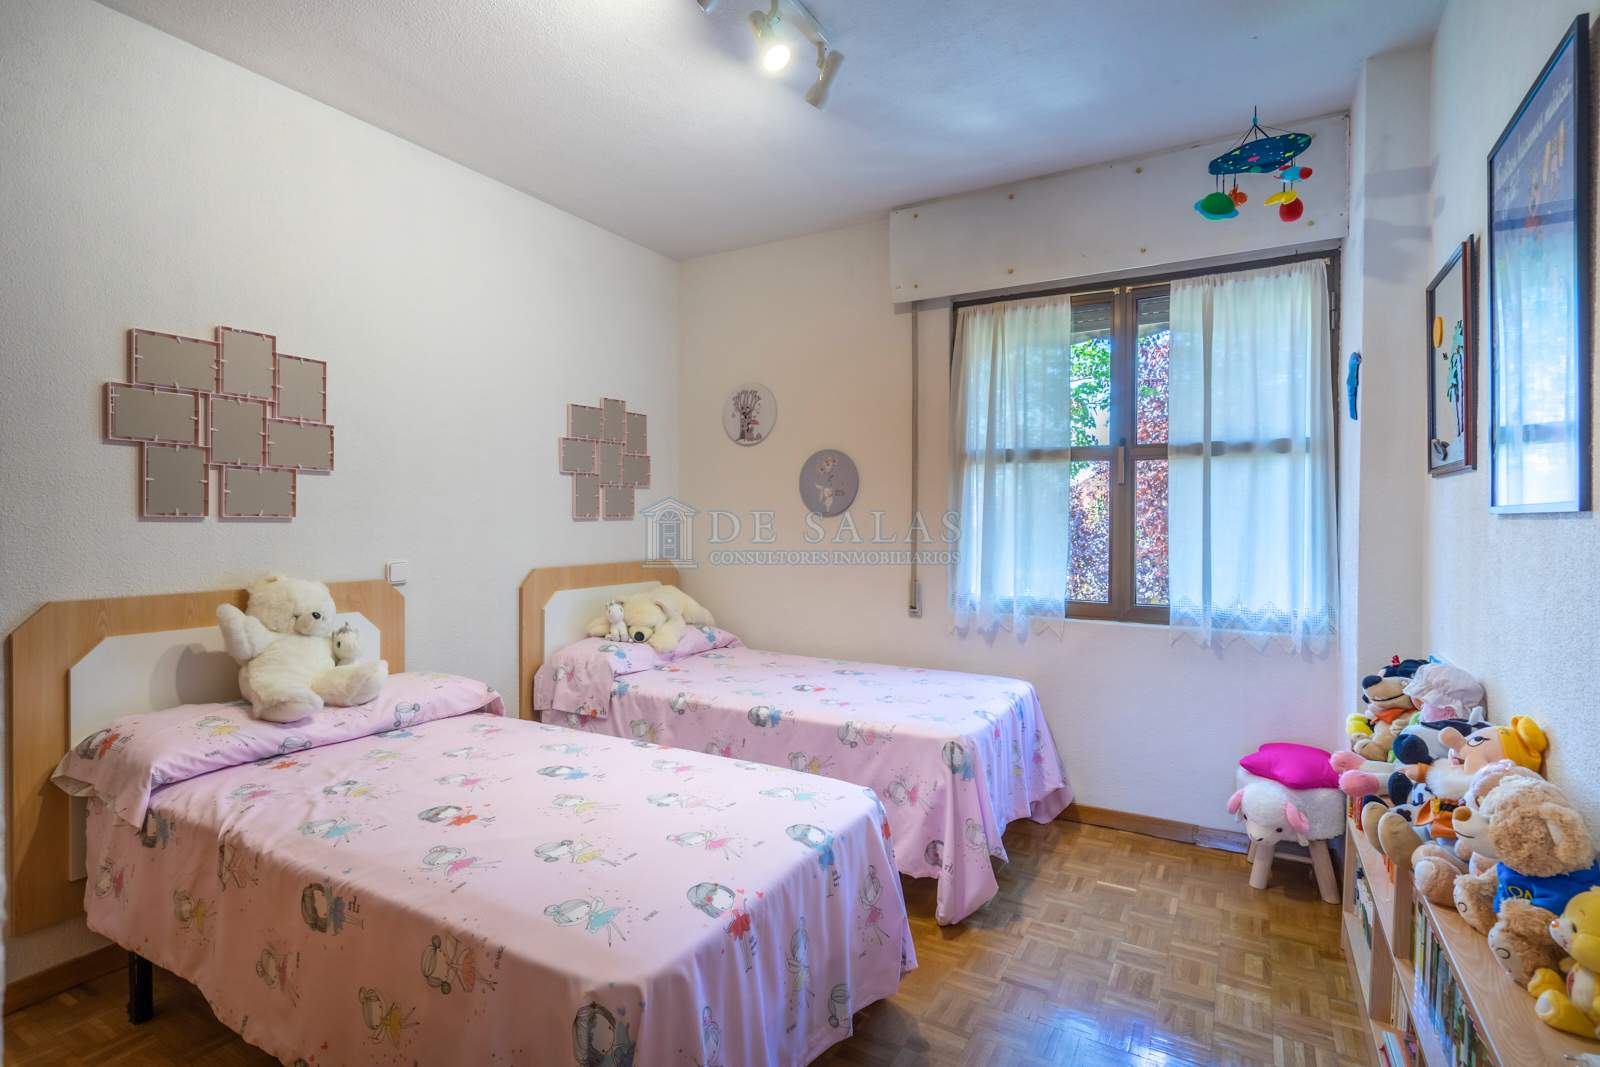 Dormitorio-26 Chalet Soto de la Moraleja